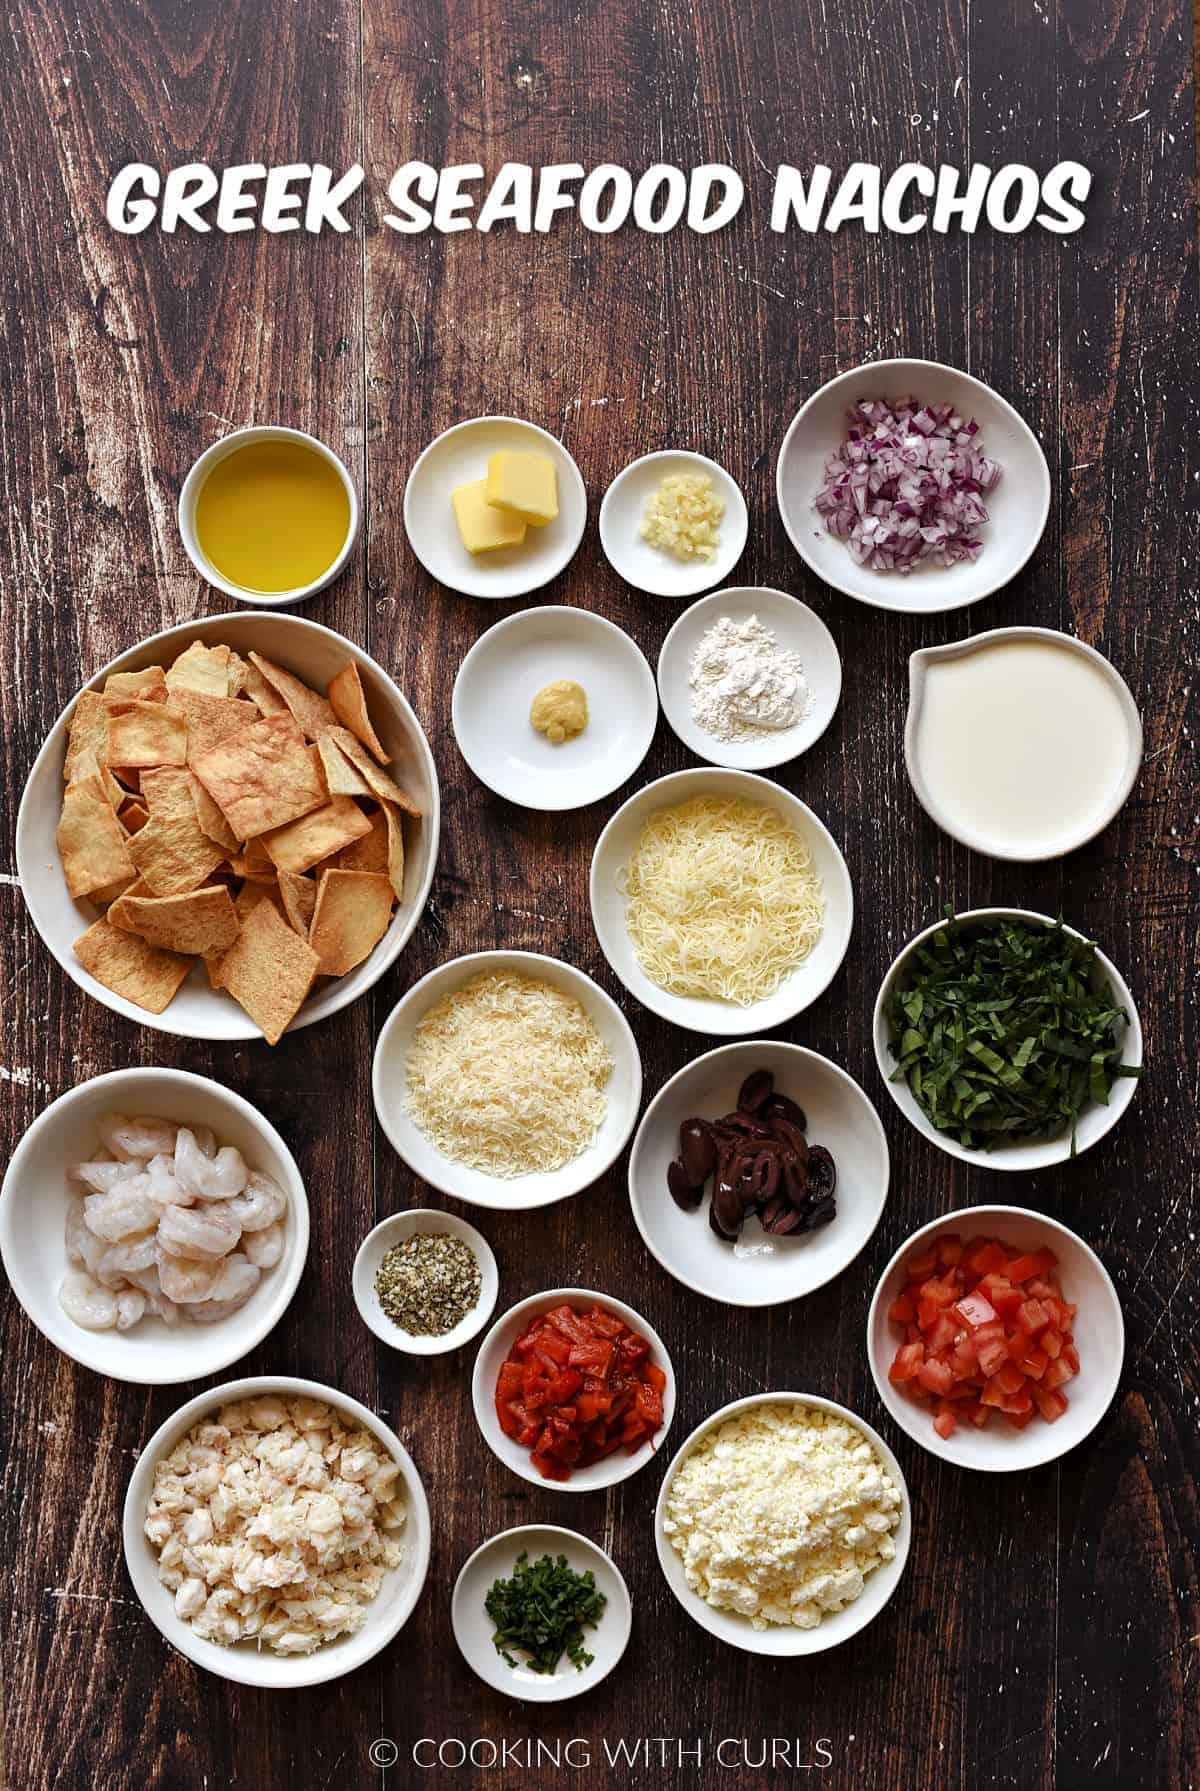 Ingredients to make Greek seafood nachos in small bowls.